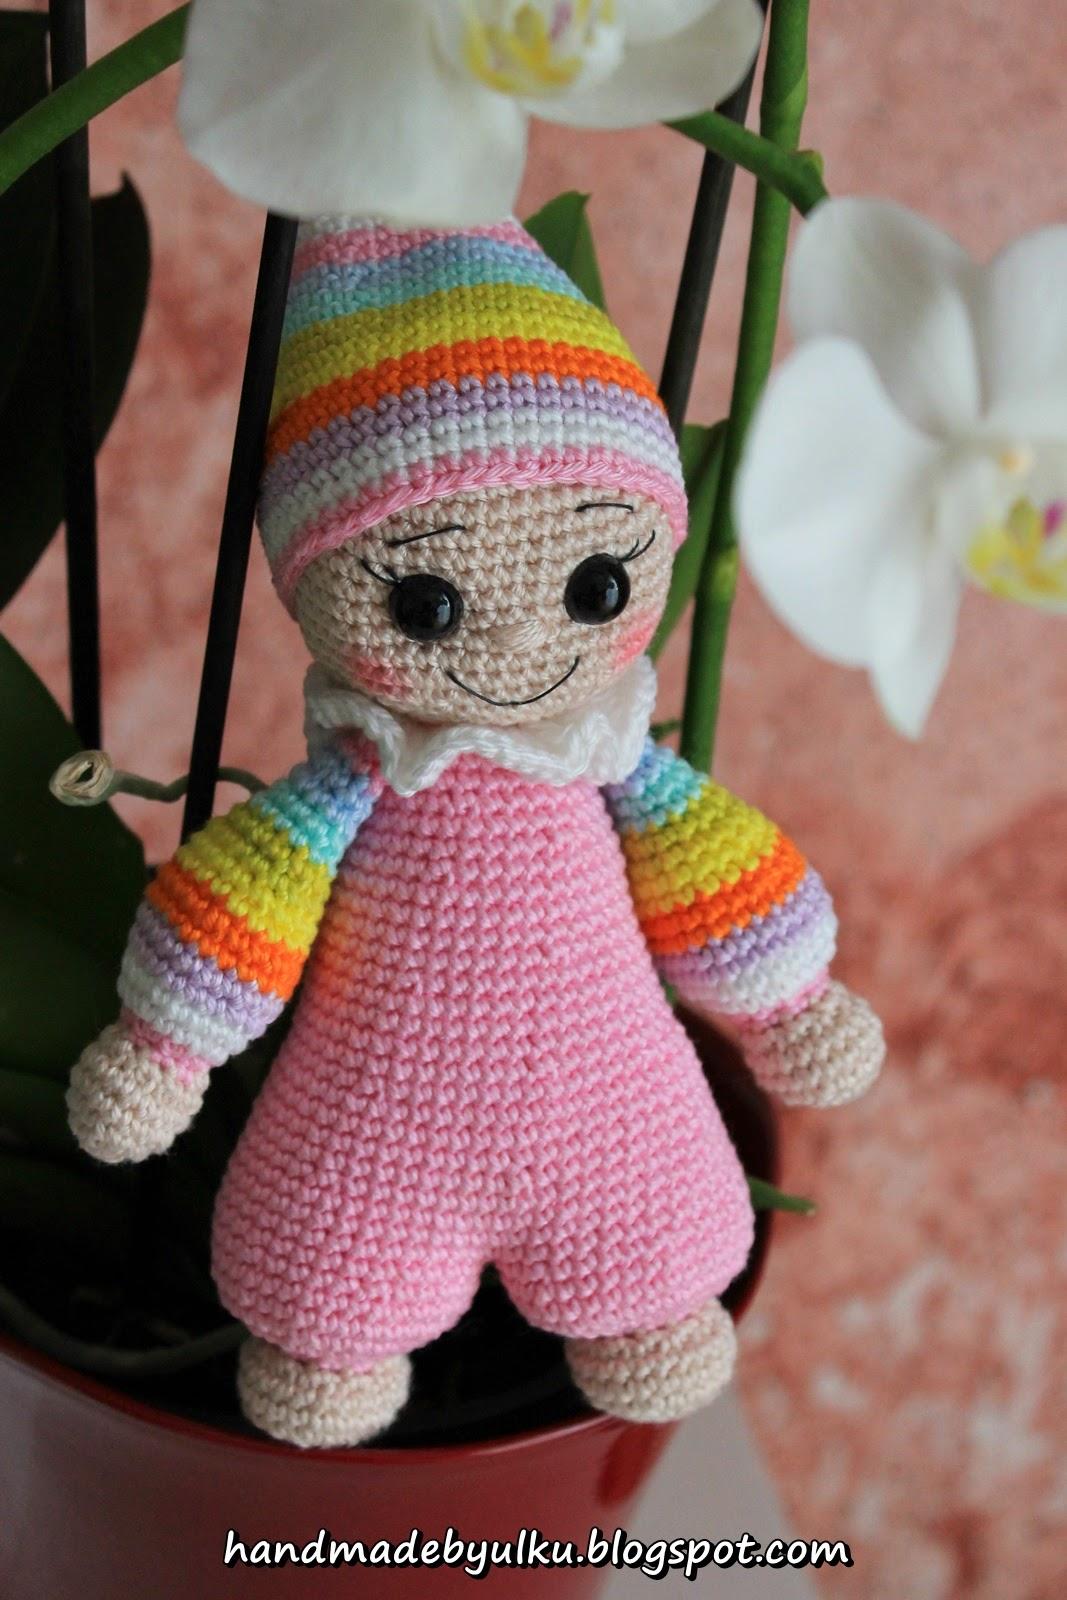 Handmade by ulku: Amigurumi Bunter Zwerg / Cuddly Baby